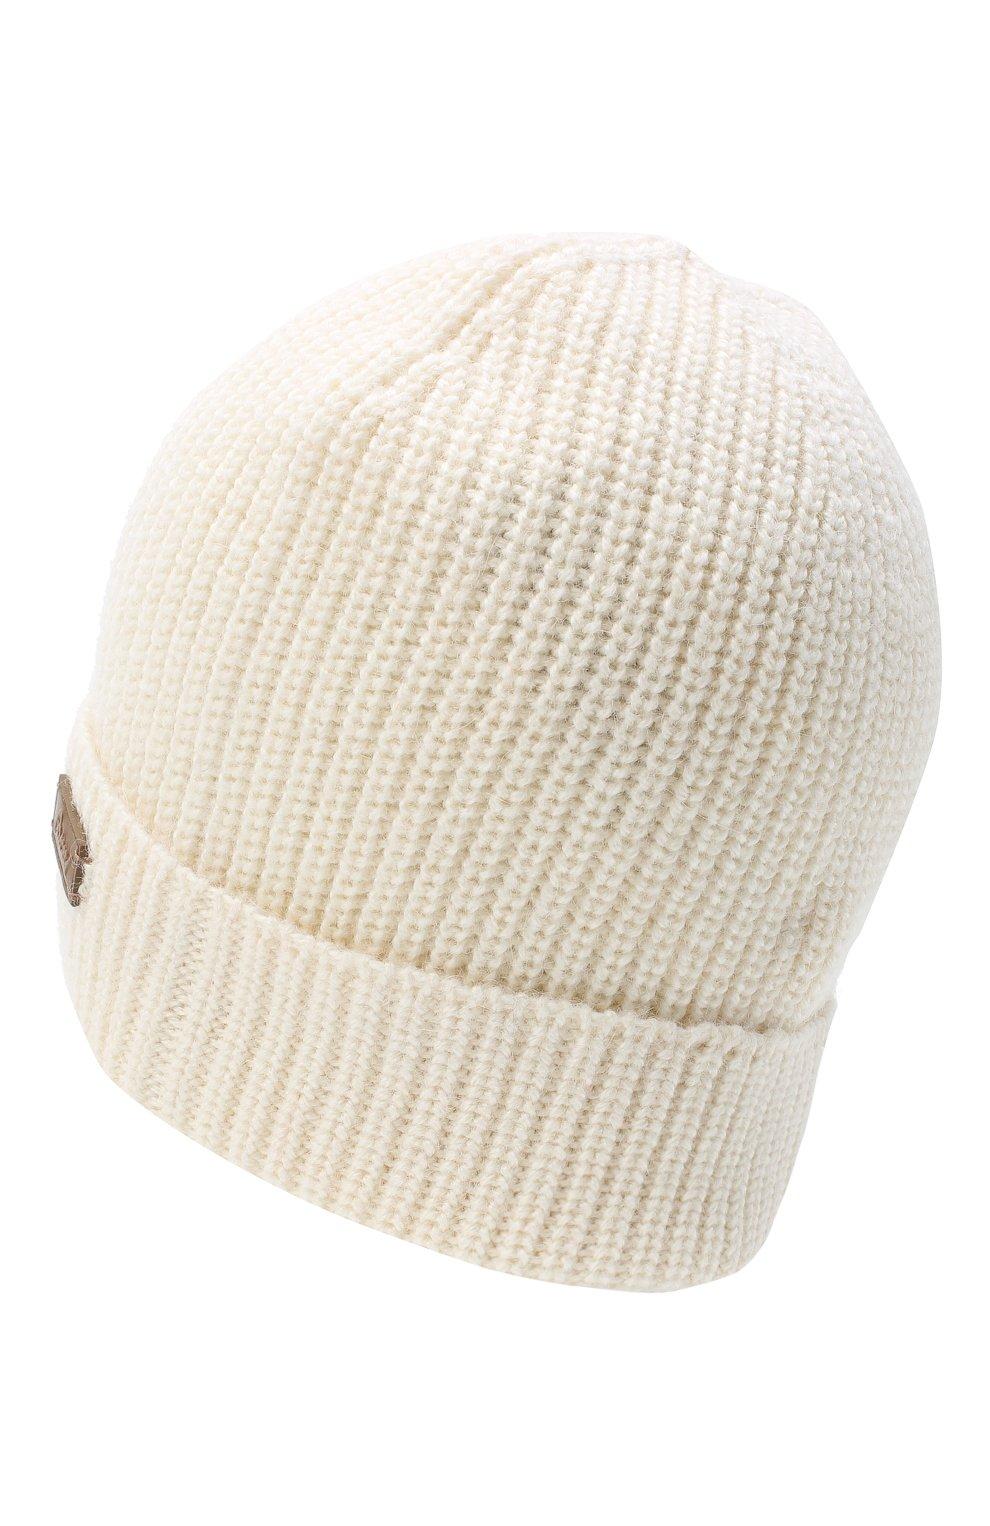 Мужская шапка из шерсти и шелка BRIONI белого цвета, арт. 04M80L/09K32   Фото 2